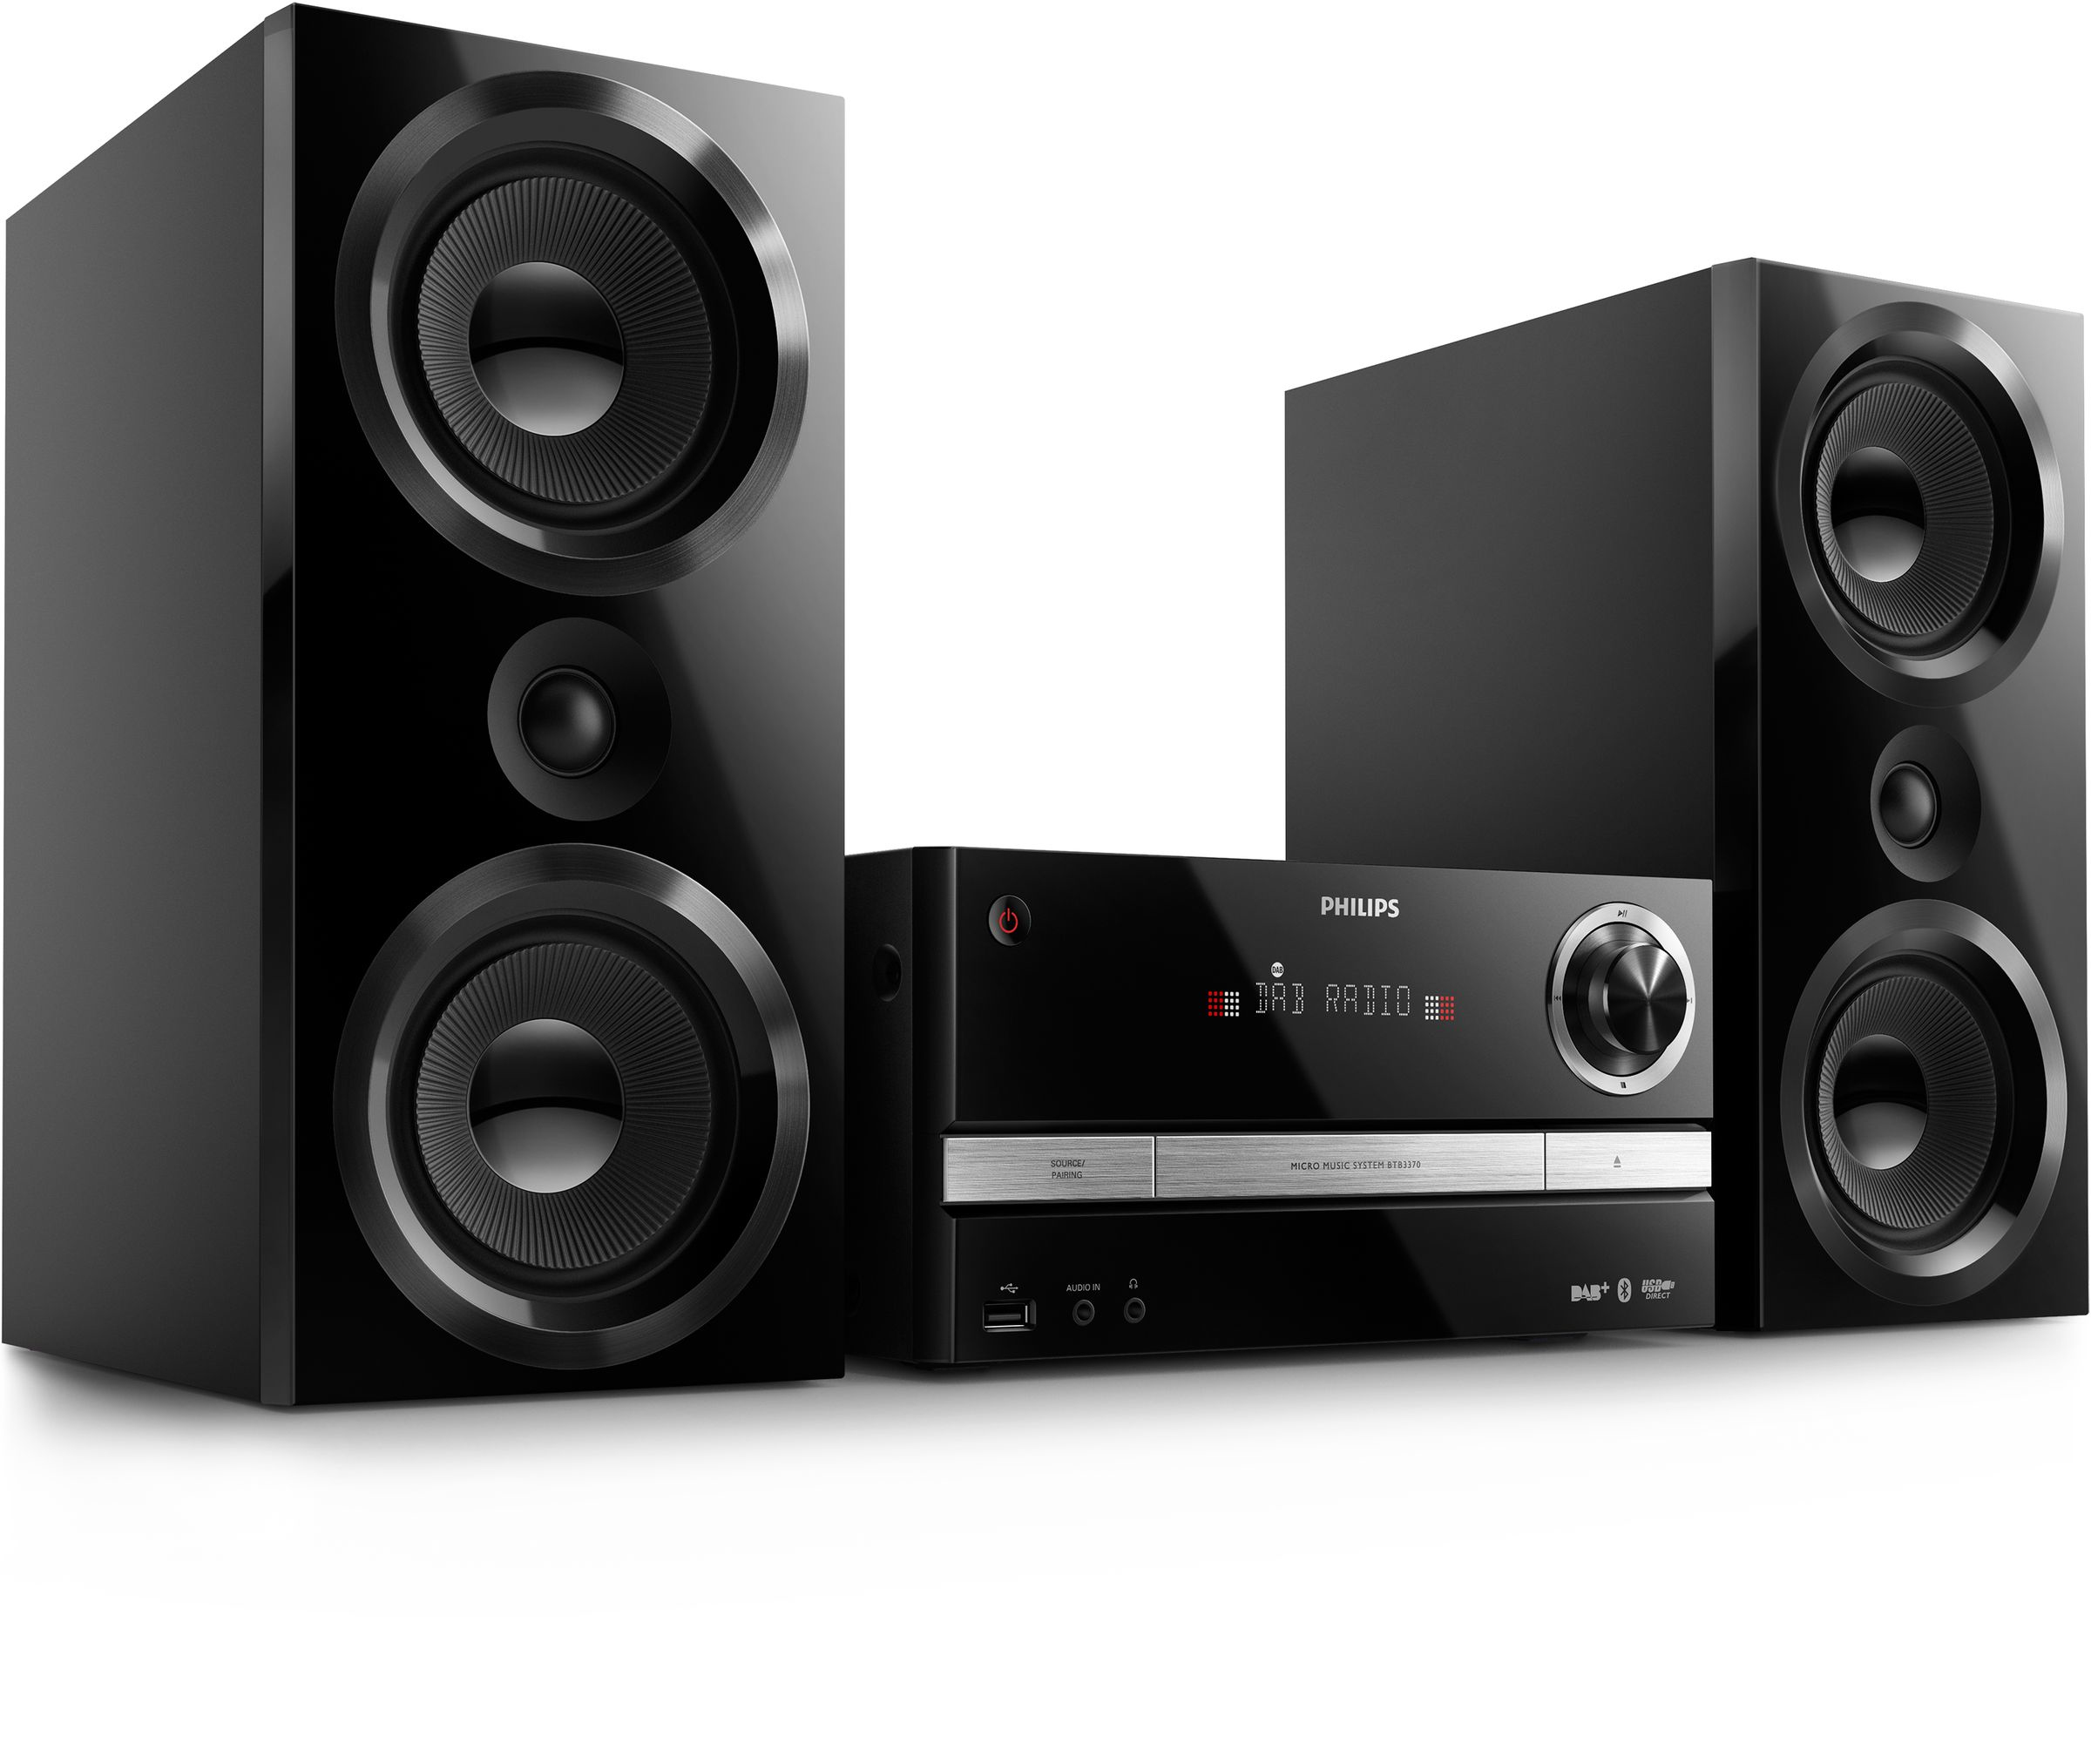 Philips BTB 3370 Mini Stereoanlage UKW-Tuner CD USB Audio-IN für 249,99 Euro